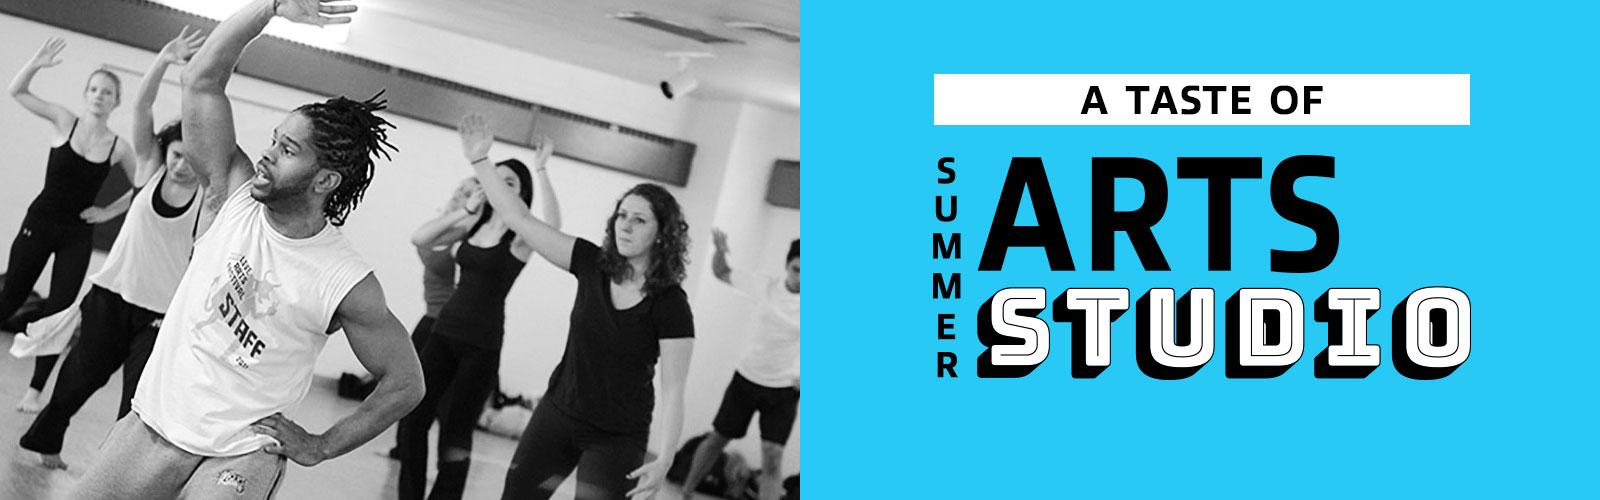 Left: UW–Madison professor of dance, Duane Holland Jr., leads a studio dance class. Right: Taste of Summer Arts Studio logo.